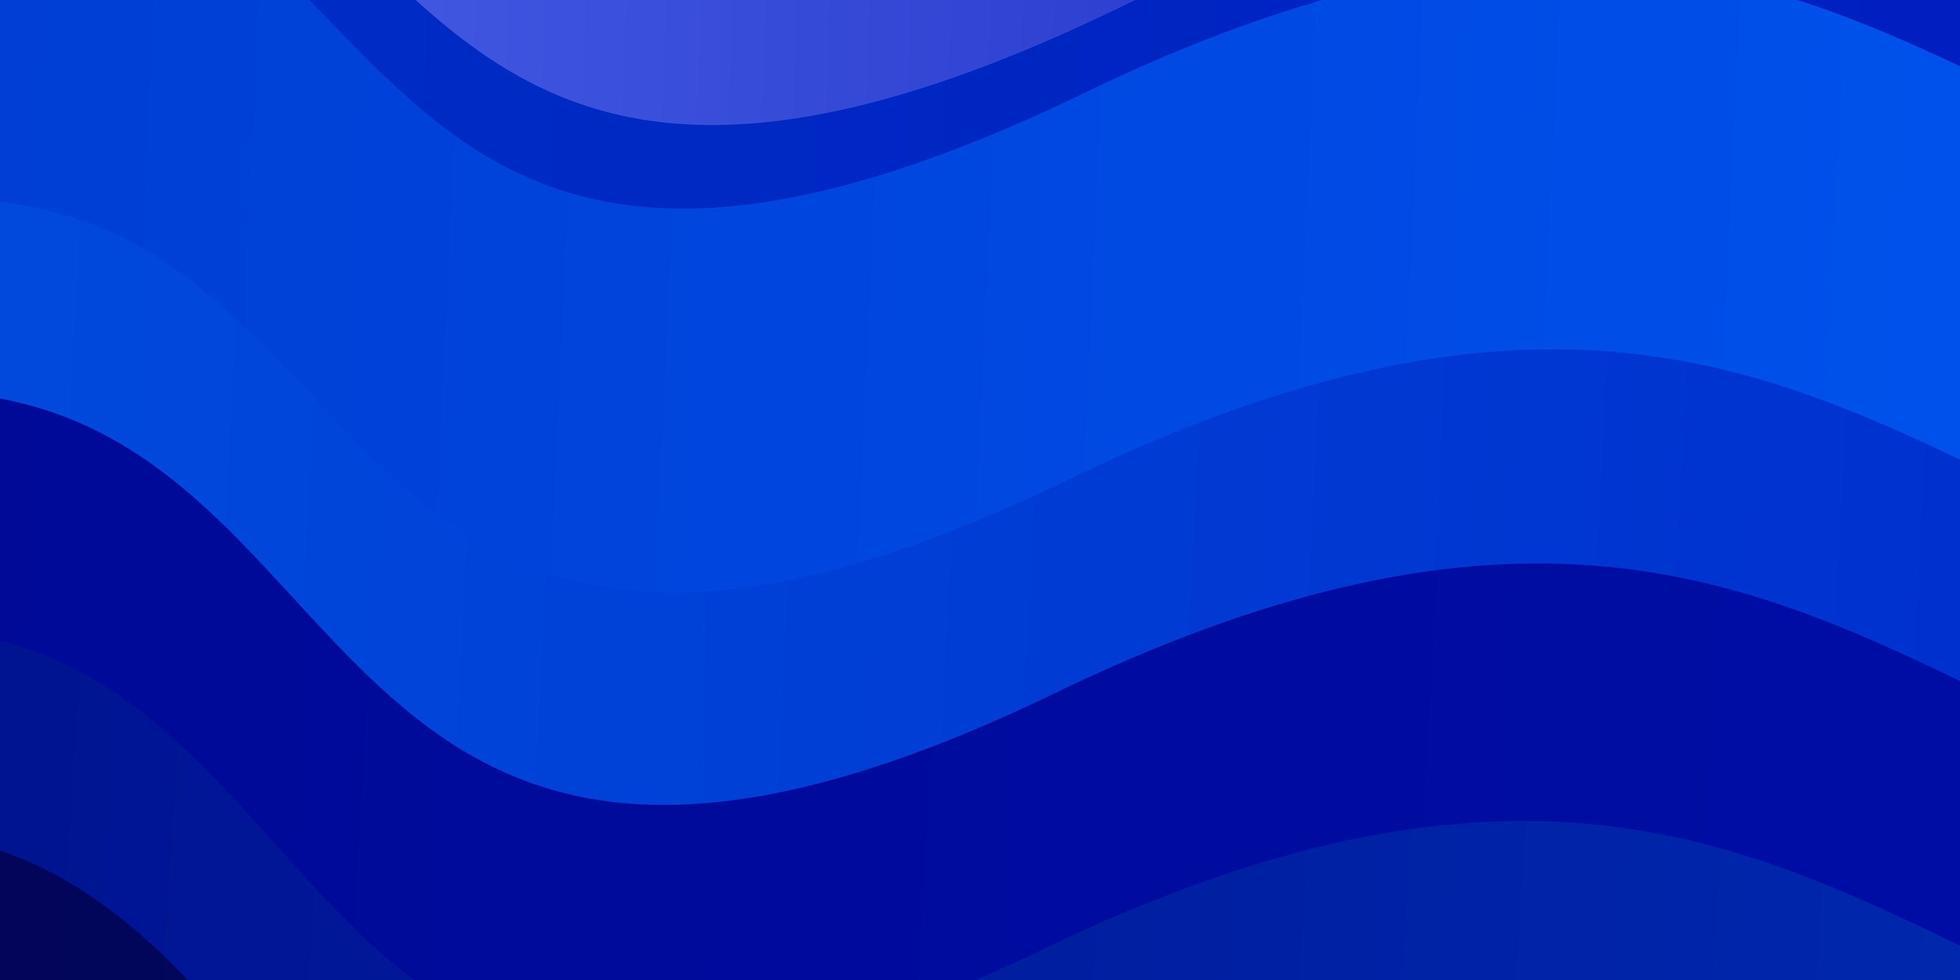 hellblaue Vektorschablone mit Kurven. vektor